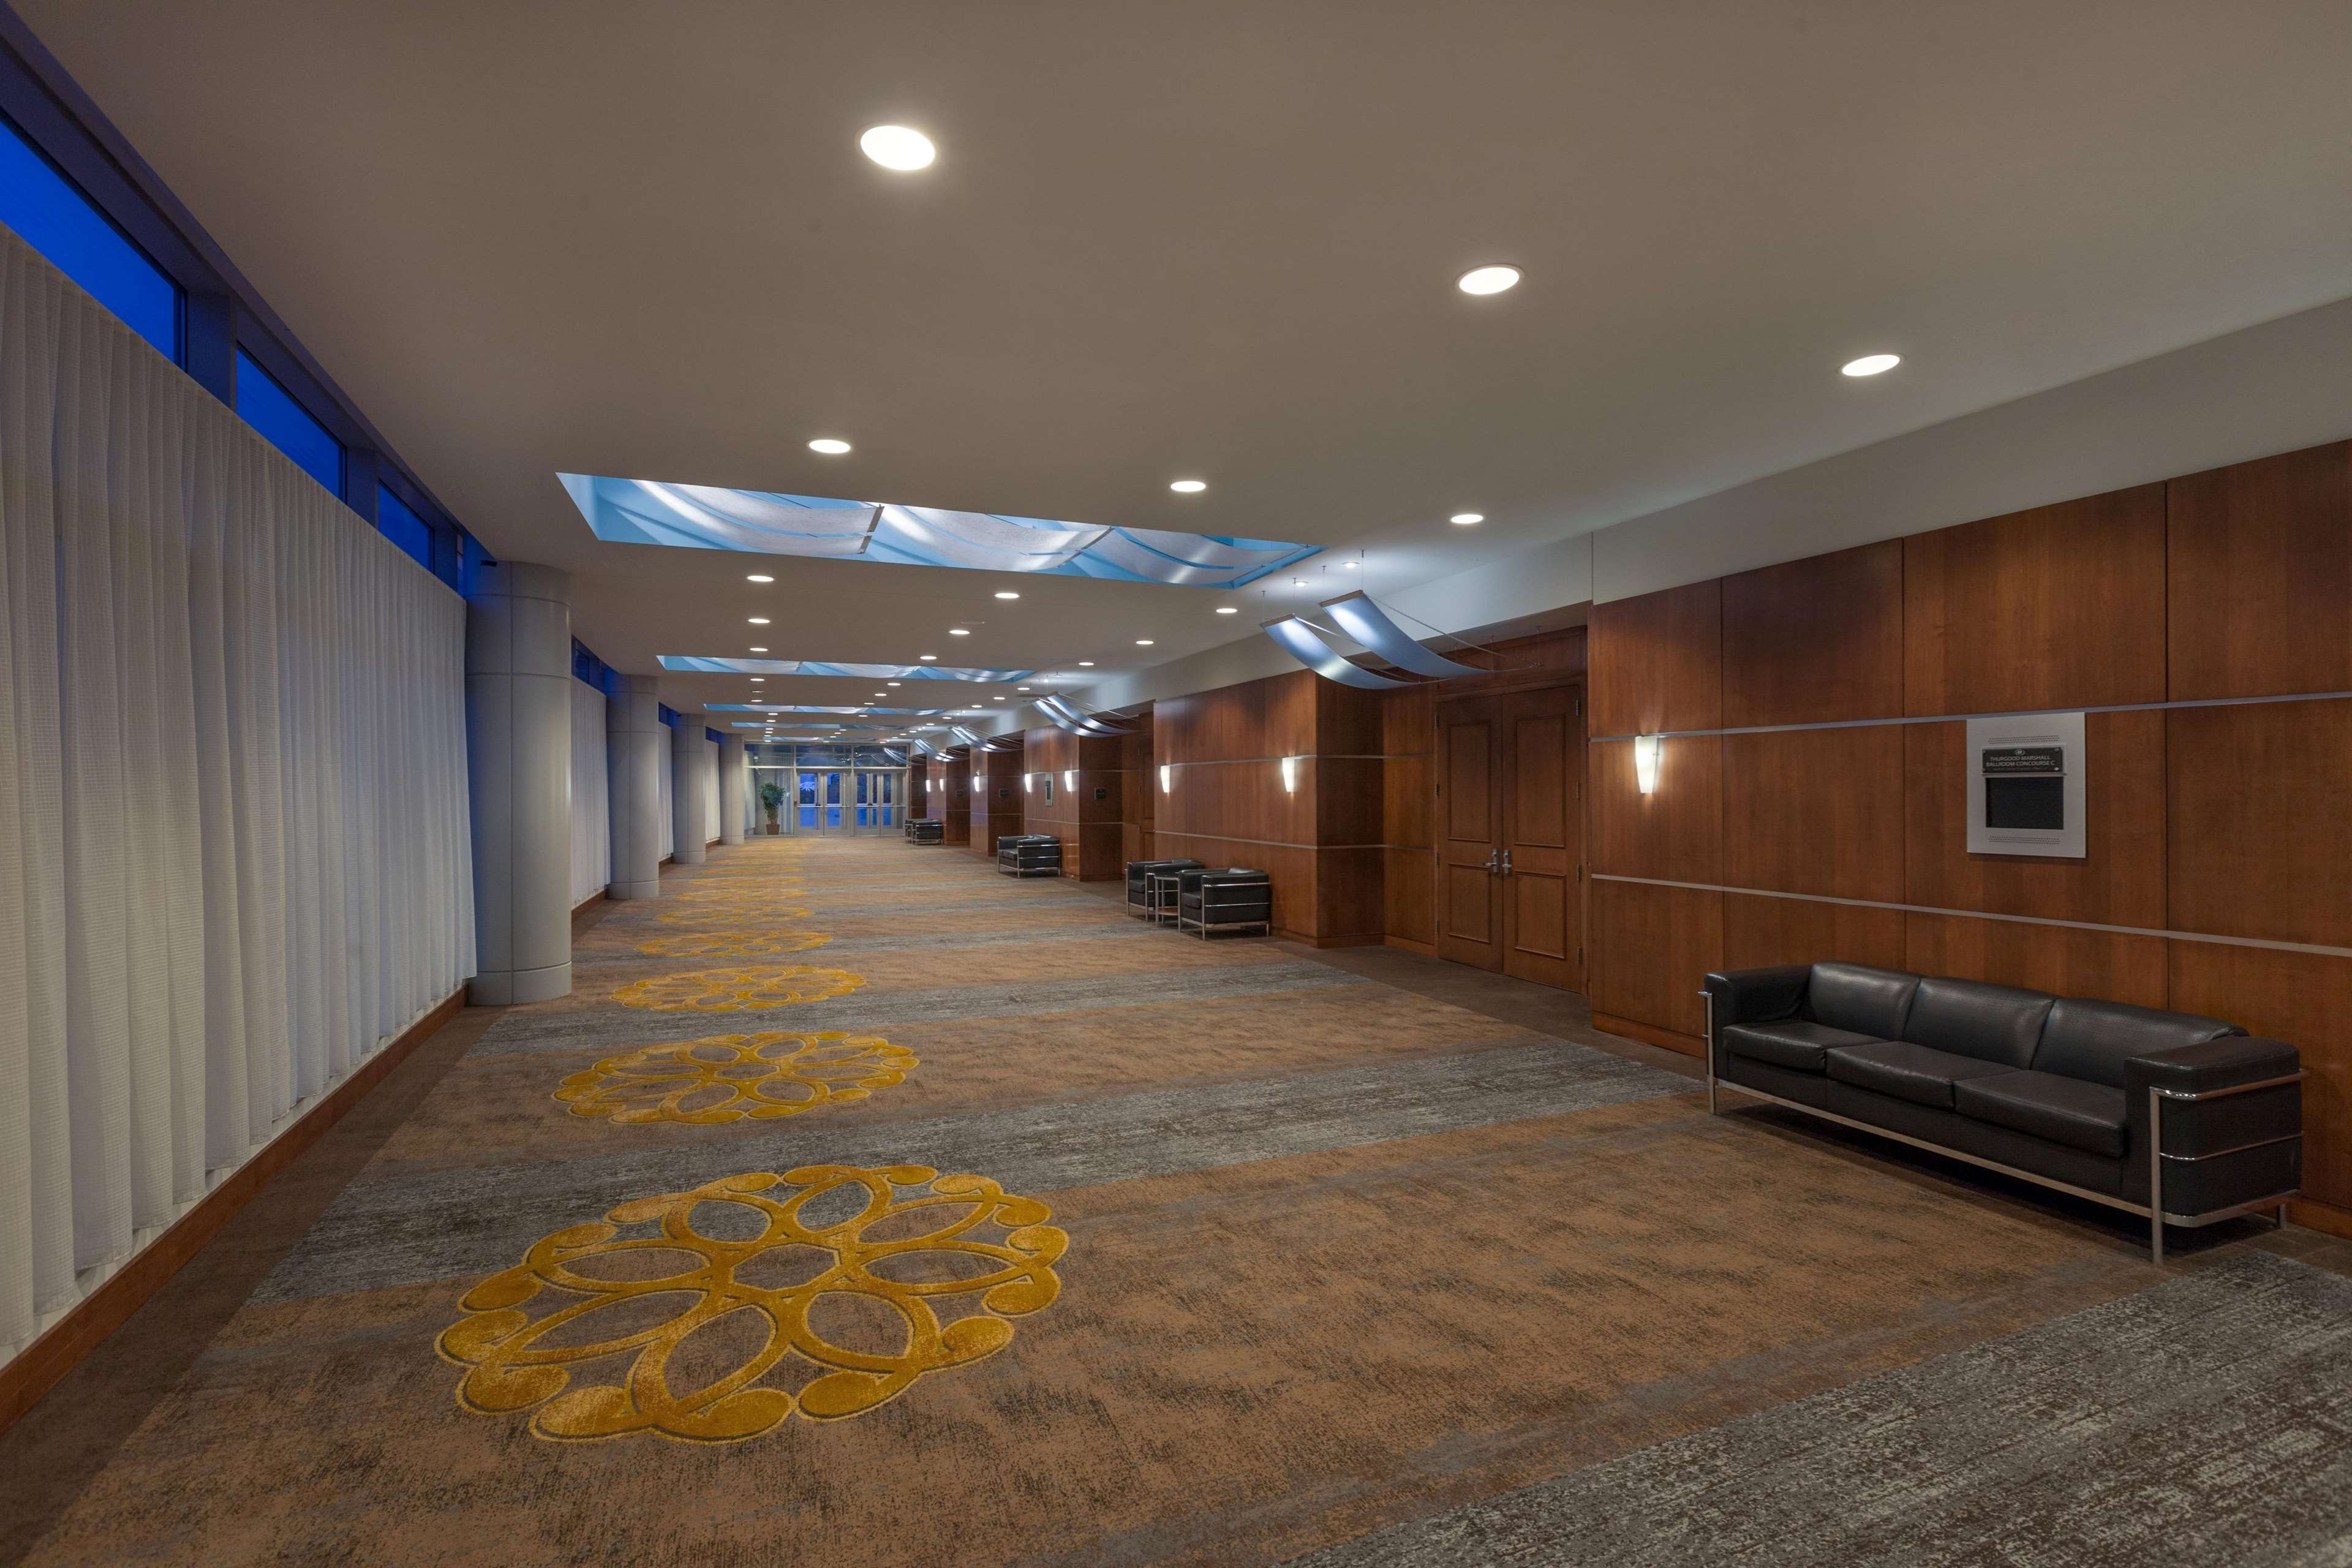 Hilton Baltimore BWI Airport image 22